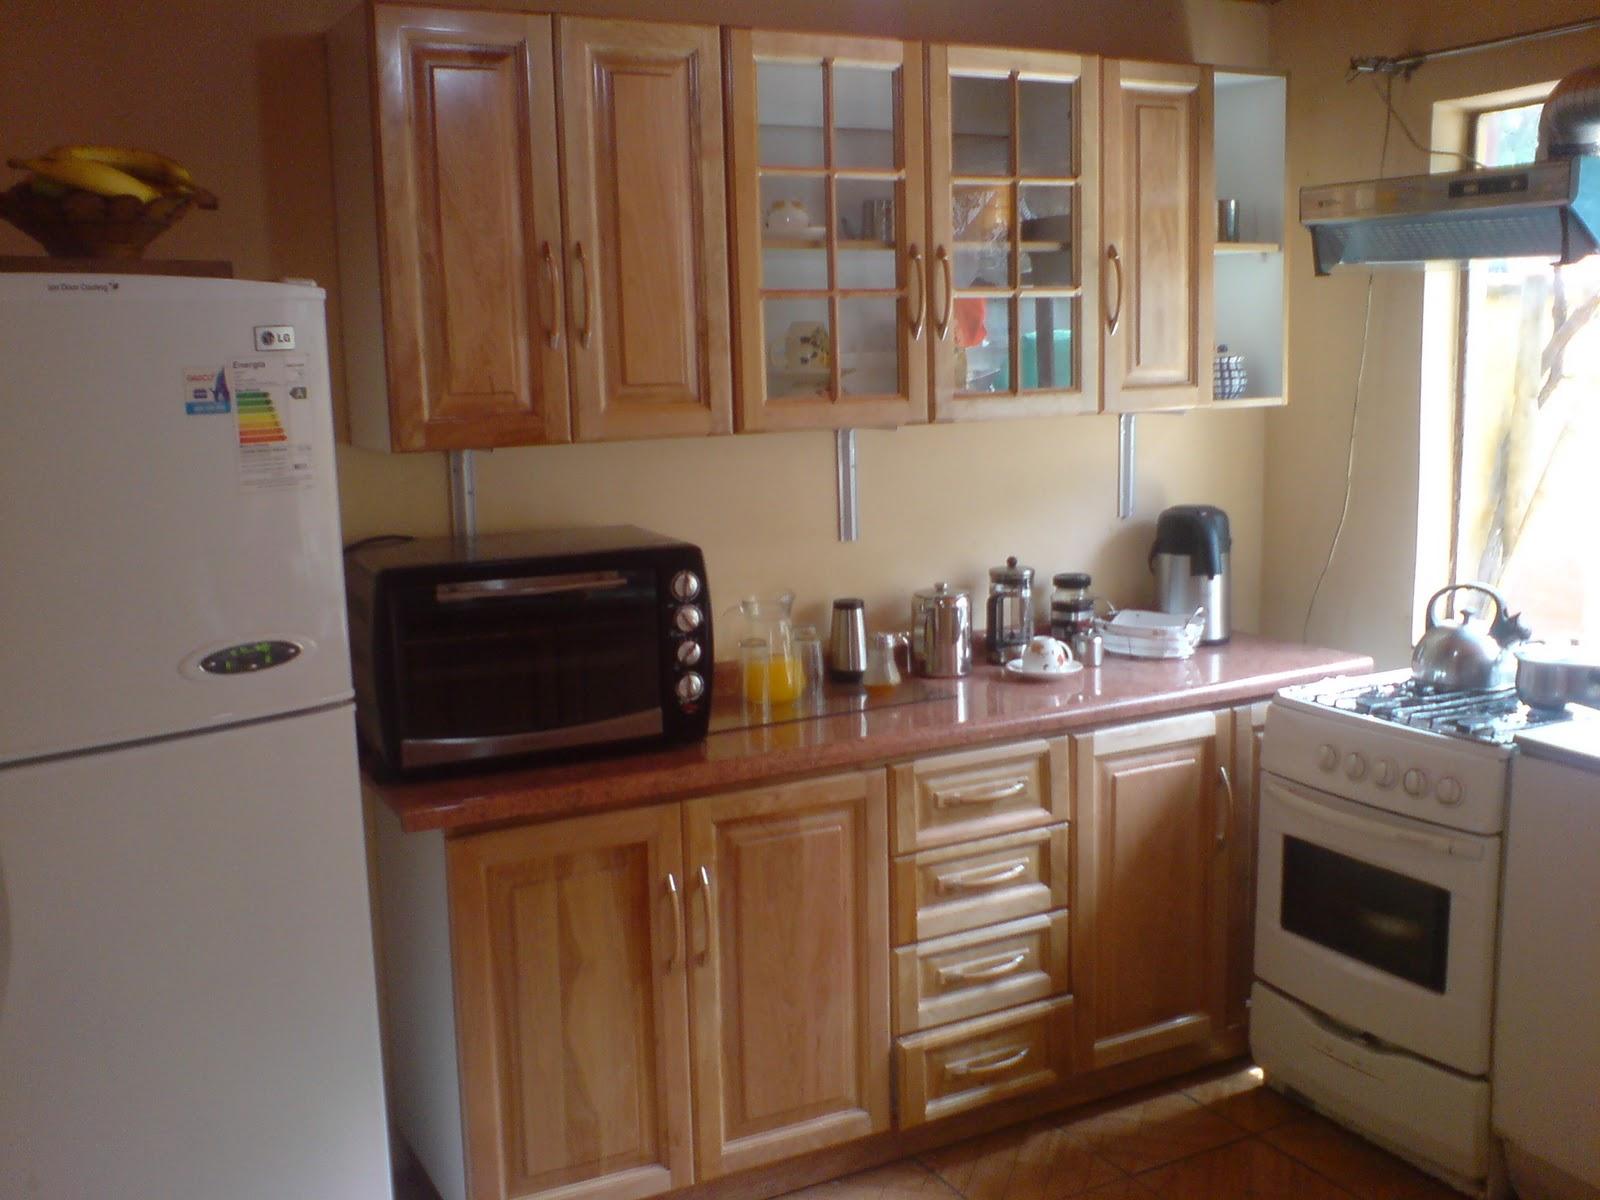 Muebles aereos de cocina en madera 20170722215303 for Modelos de puertas de madera para cocina integral